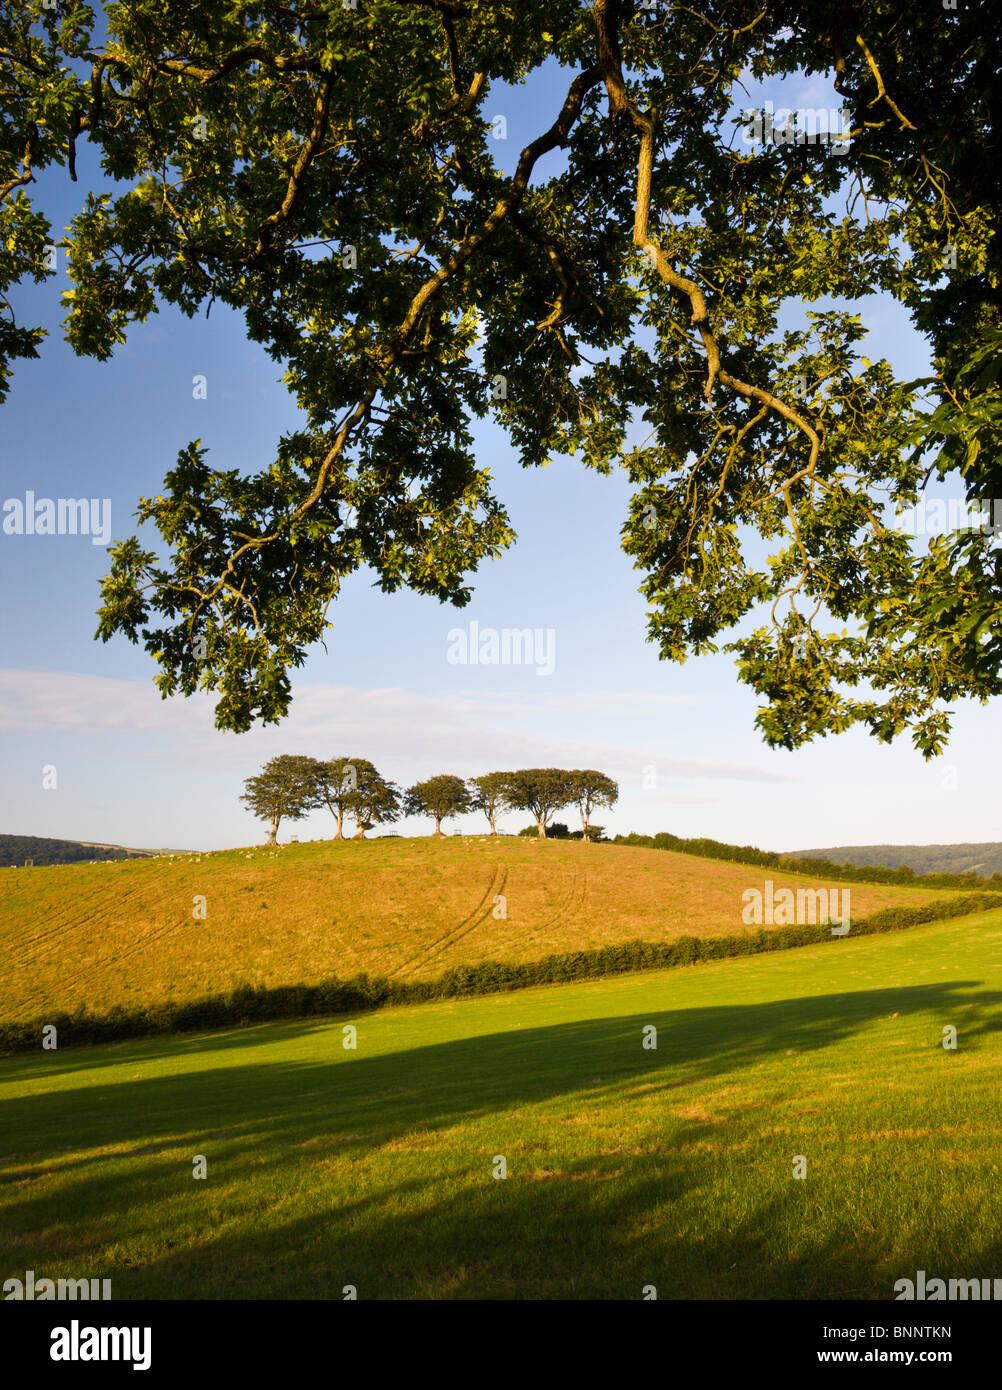 Sommer Exmoor Landschaft Szenen zwischen den Dörfern Horner und Luccombe, Exmoor National Park, Somerset, England. Stockbild